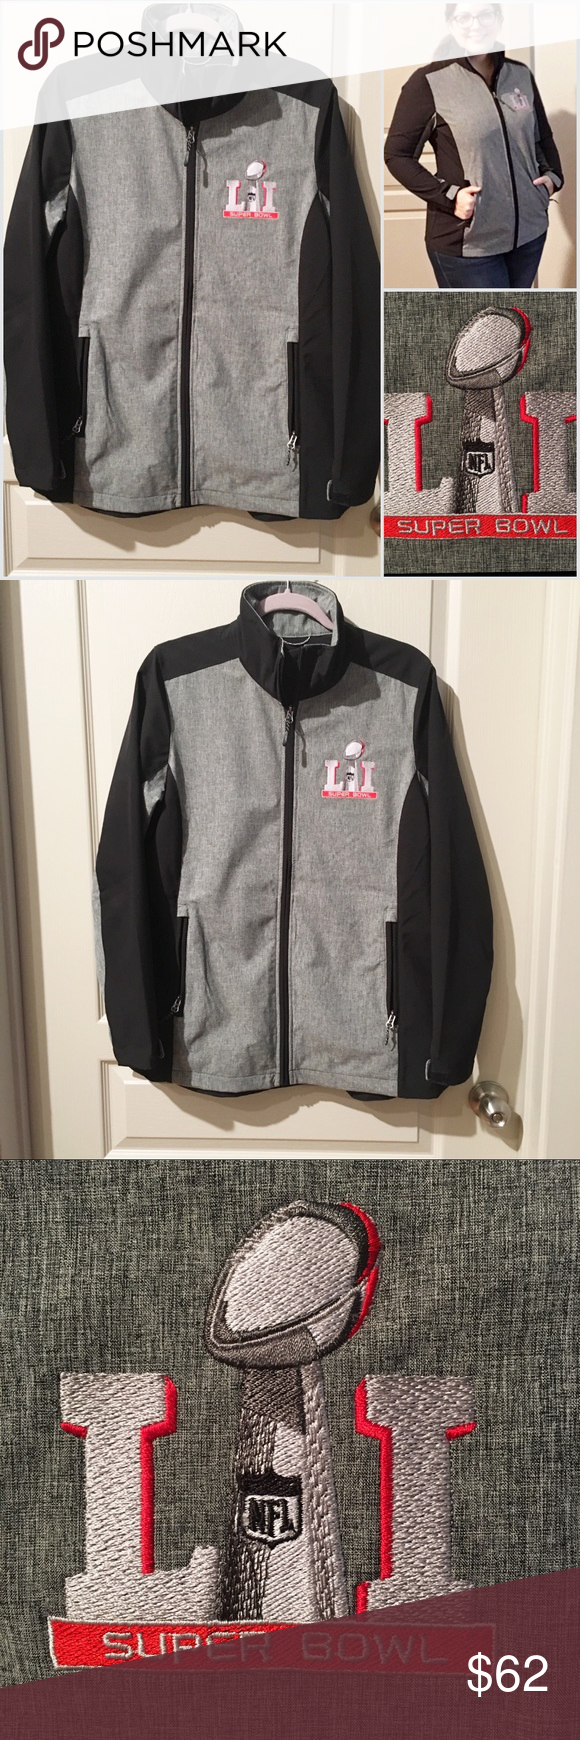 newest dd852 26754 NFL Super Bowl 51 Official Gear Jacket | My Posh Picks ...